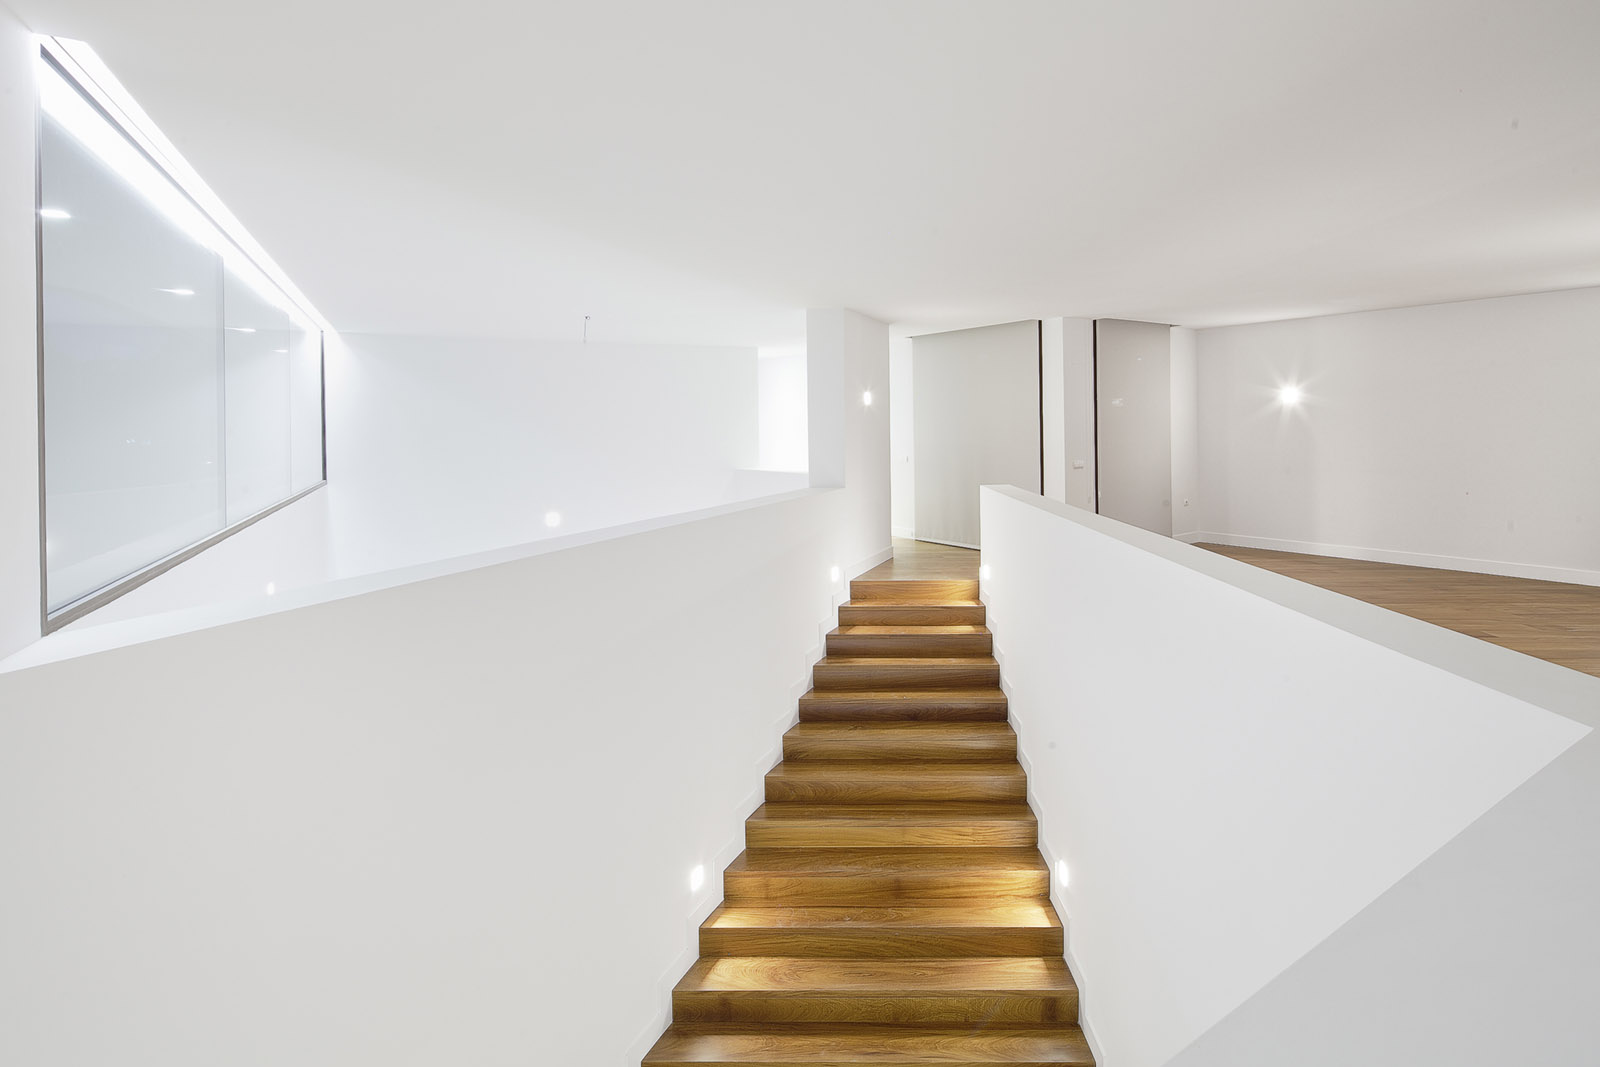 Architectural588-Interior-photographer-Madrid-Spain-.jpg